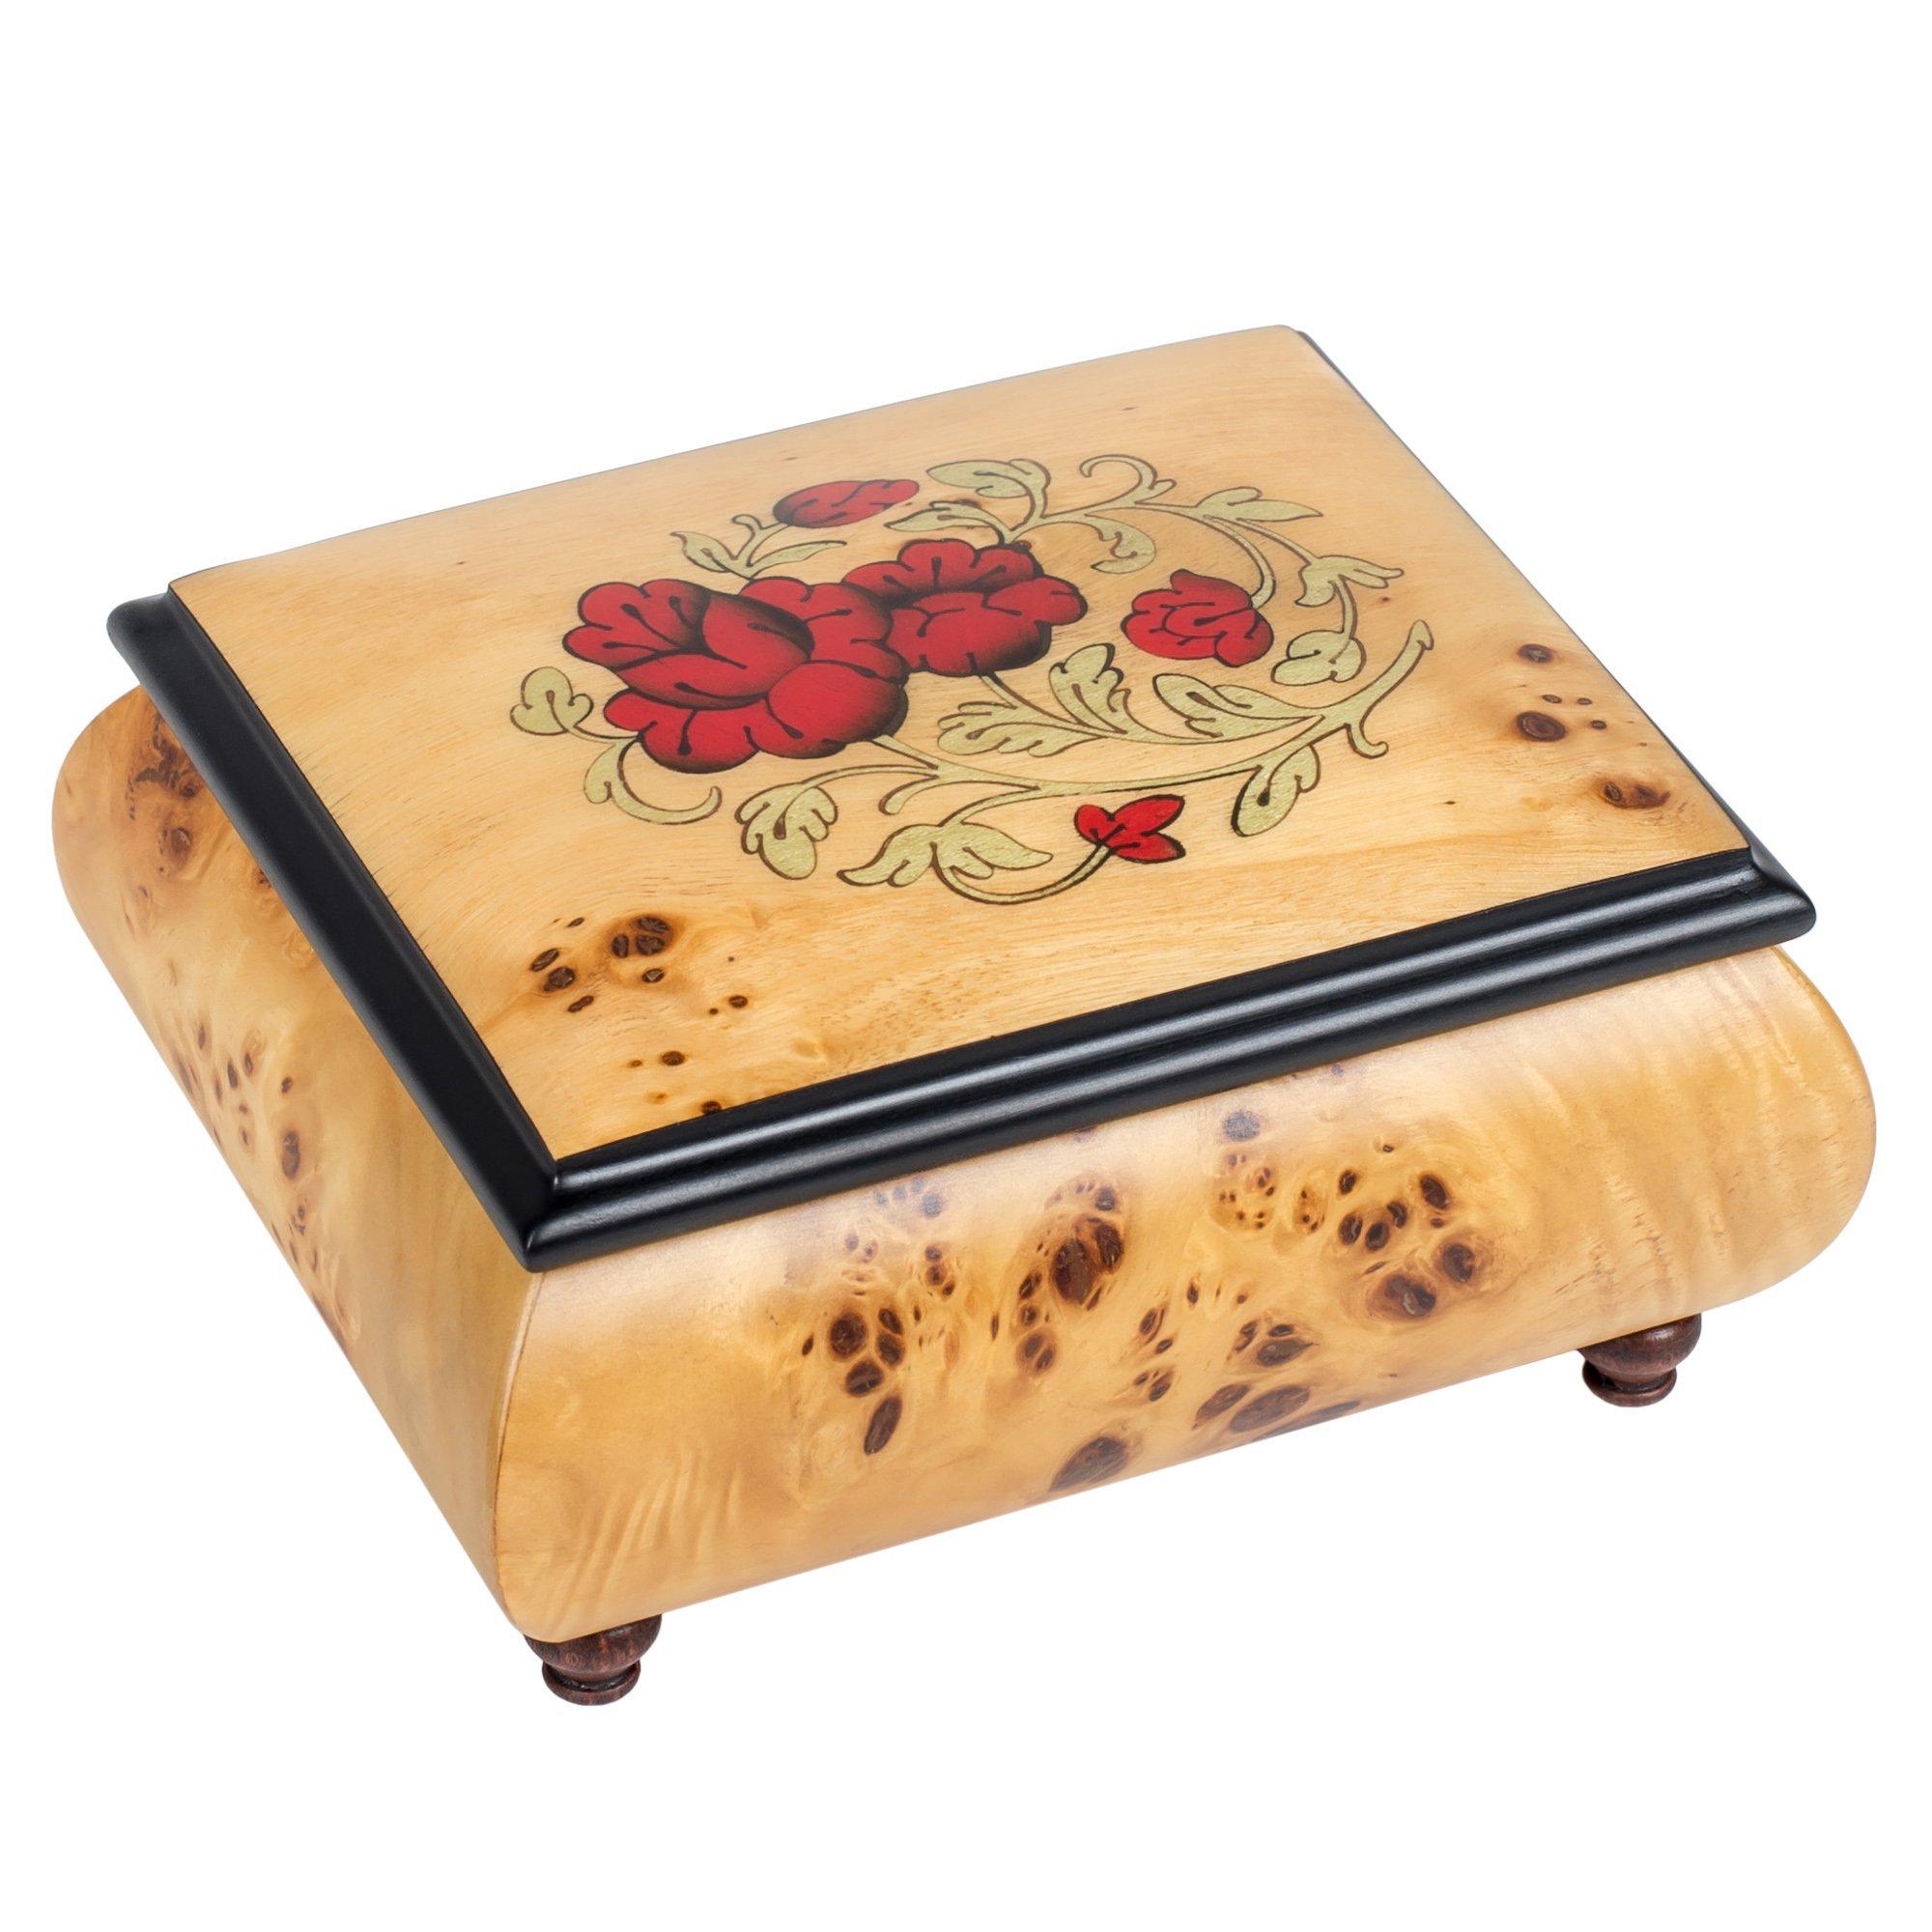 Red Wild Roses Pioppo Italian Inlaid Wood Jewelry Music Box Plays La Vie en Rose by Splendid Music Box Co.